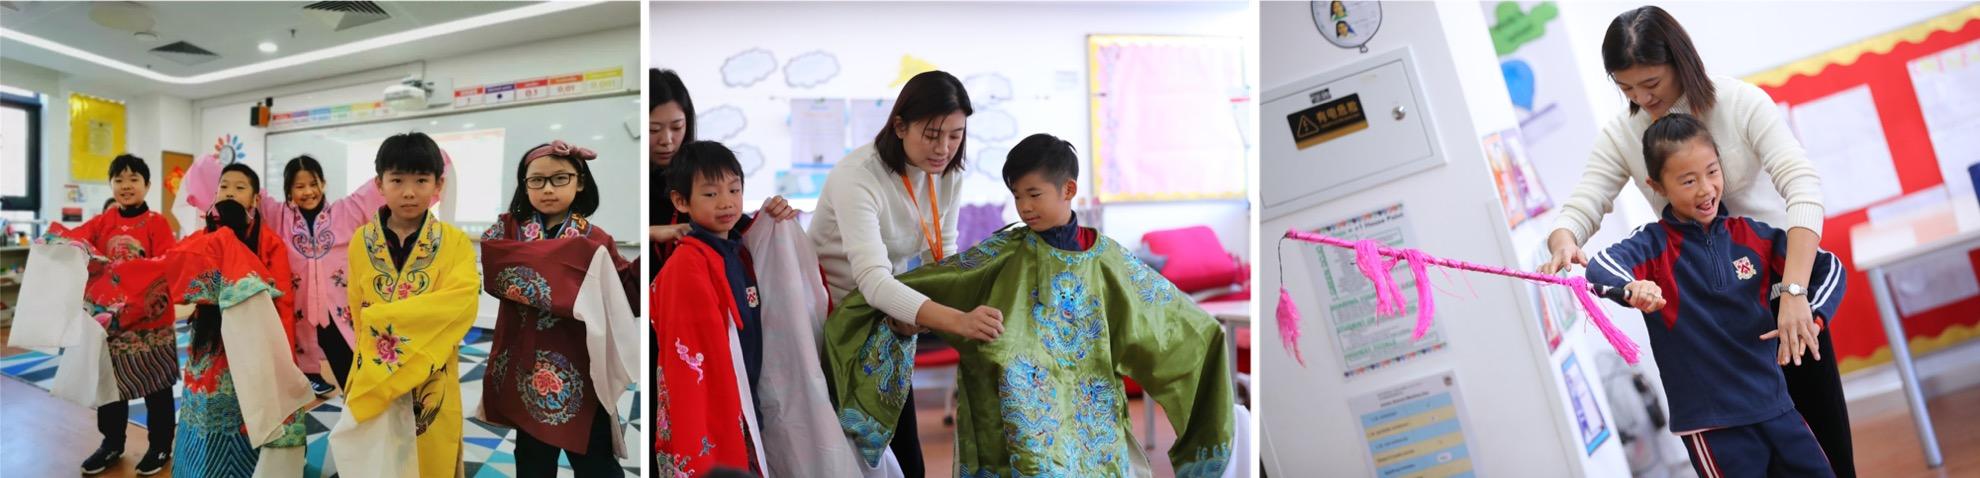 Students Learning Peking Opera